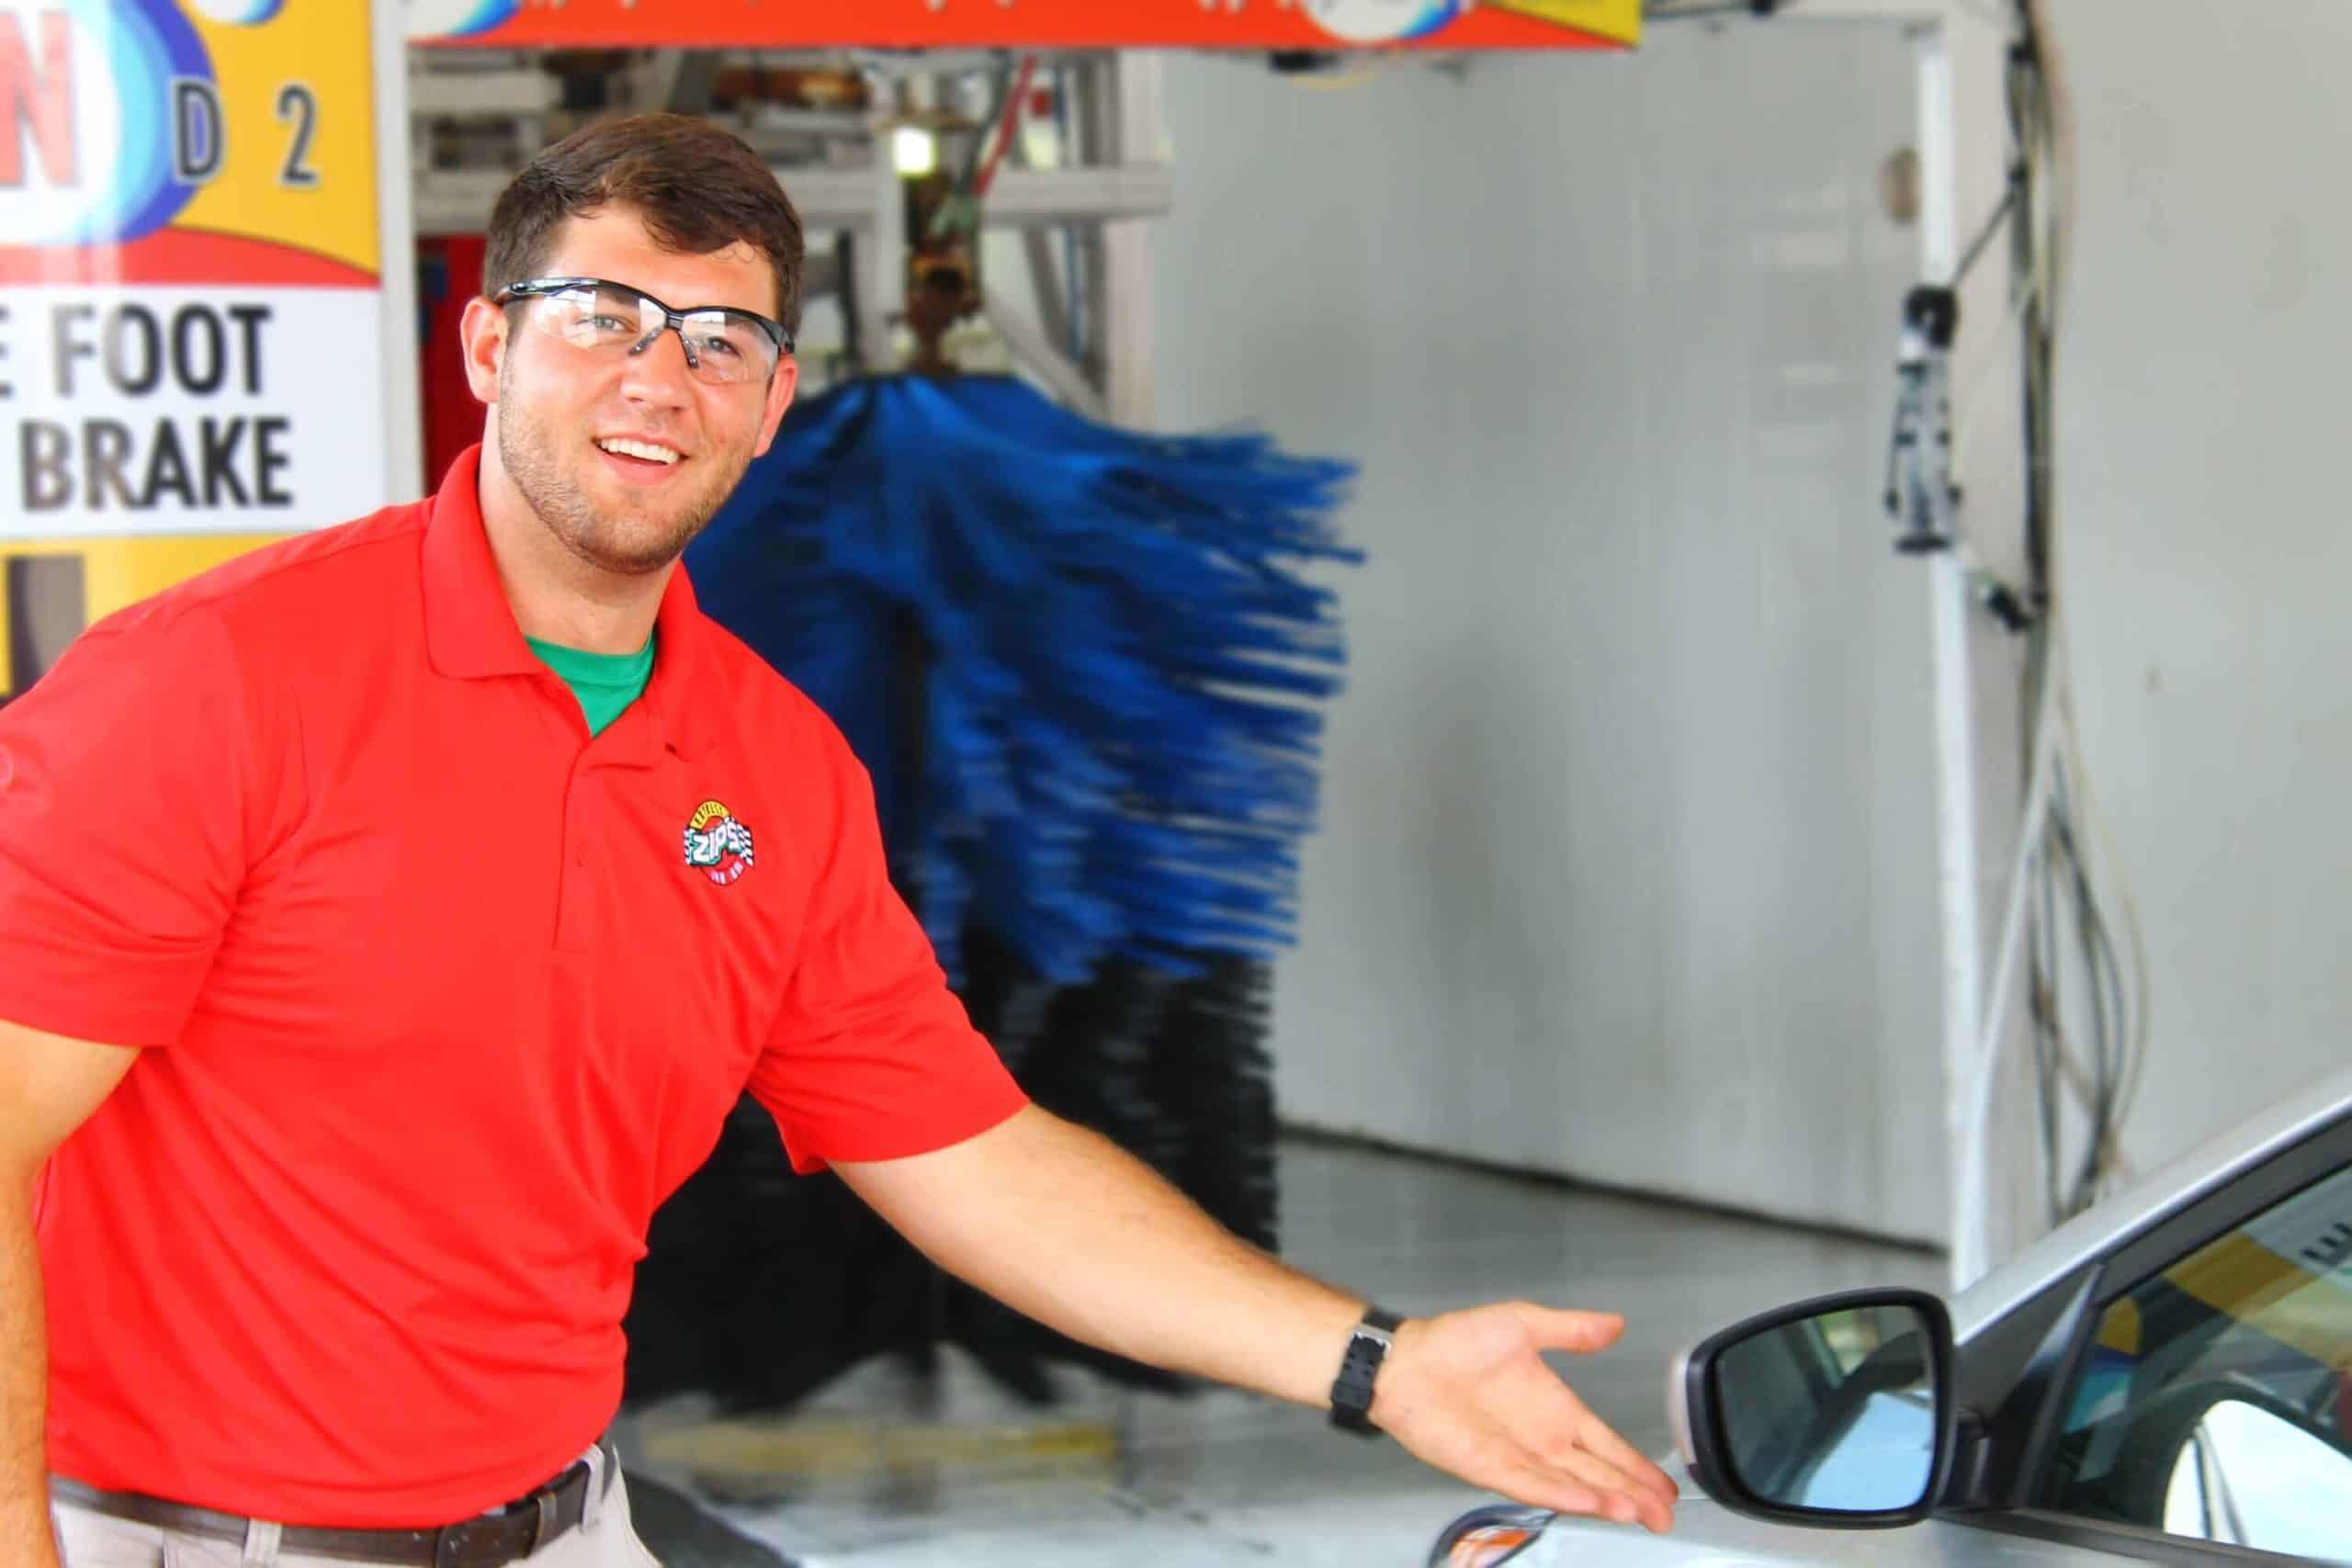 Zips Car Wash Customer engagement